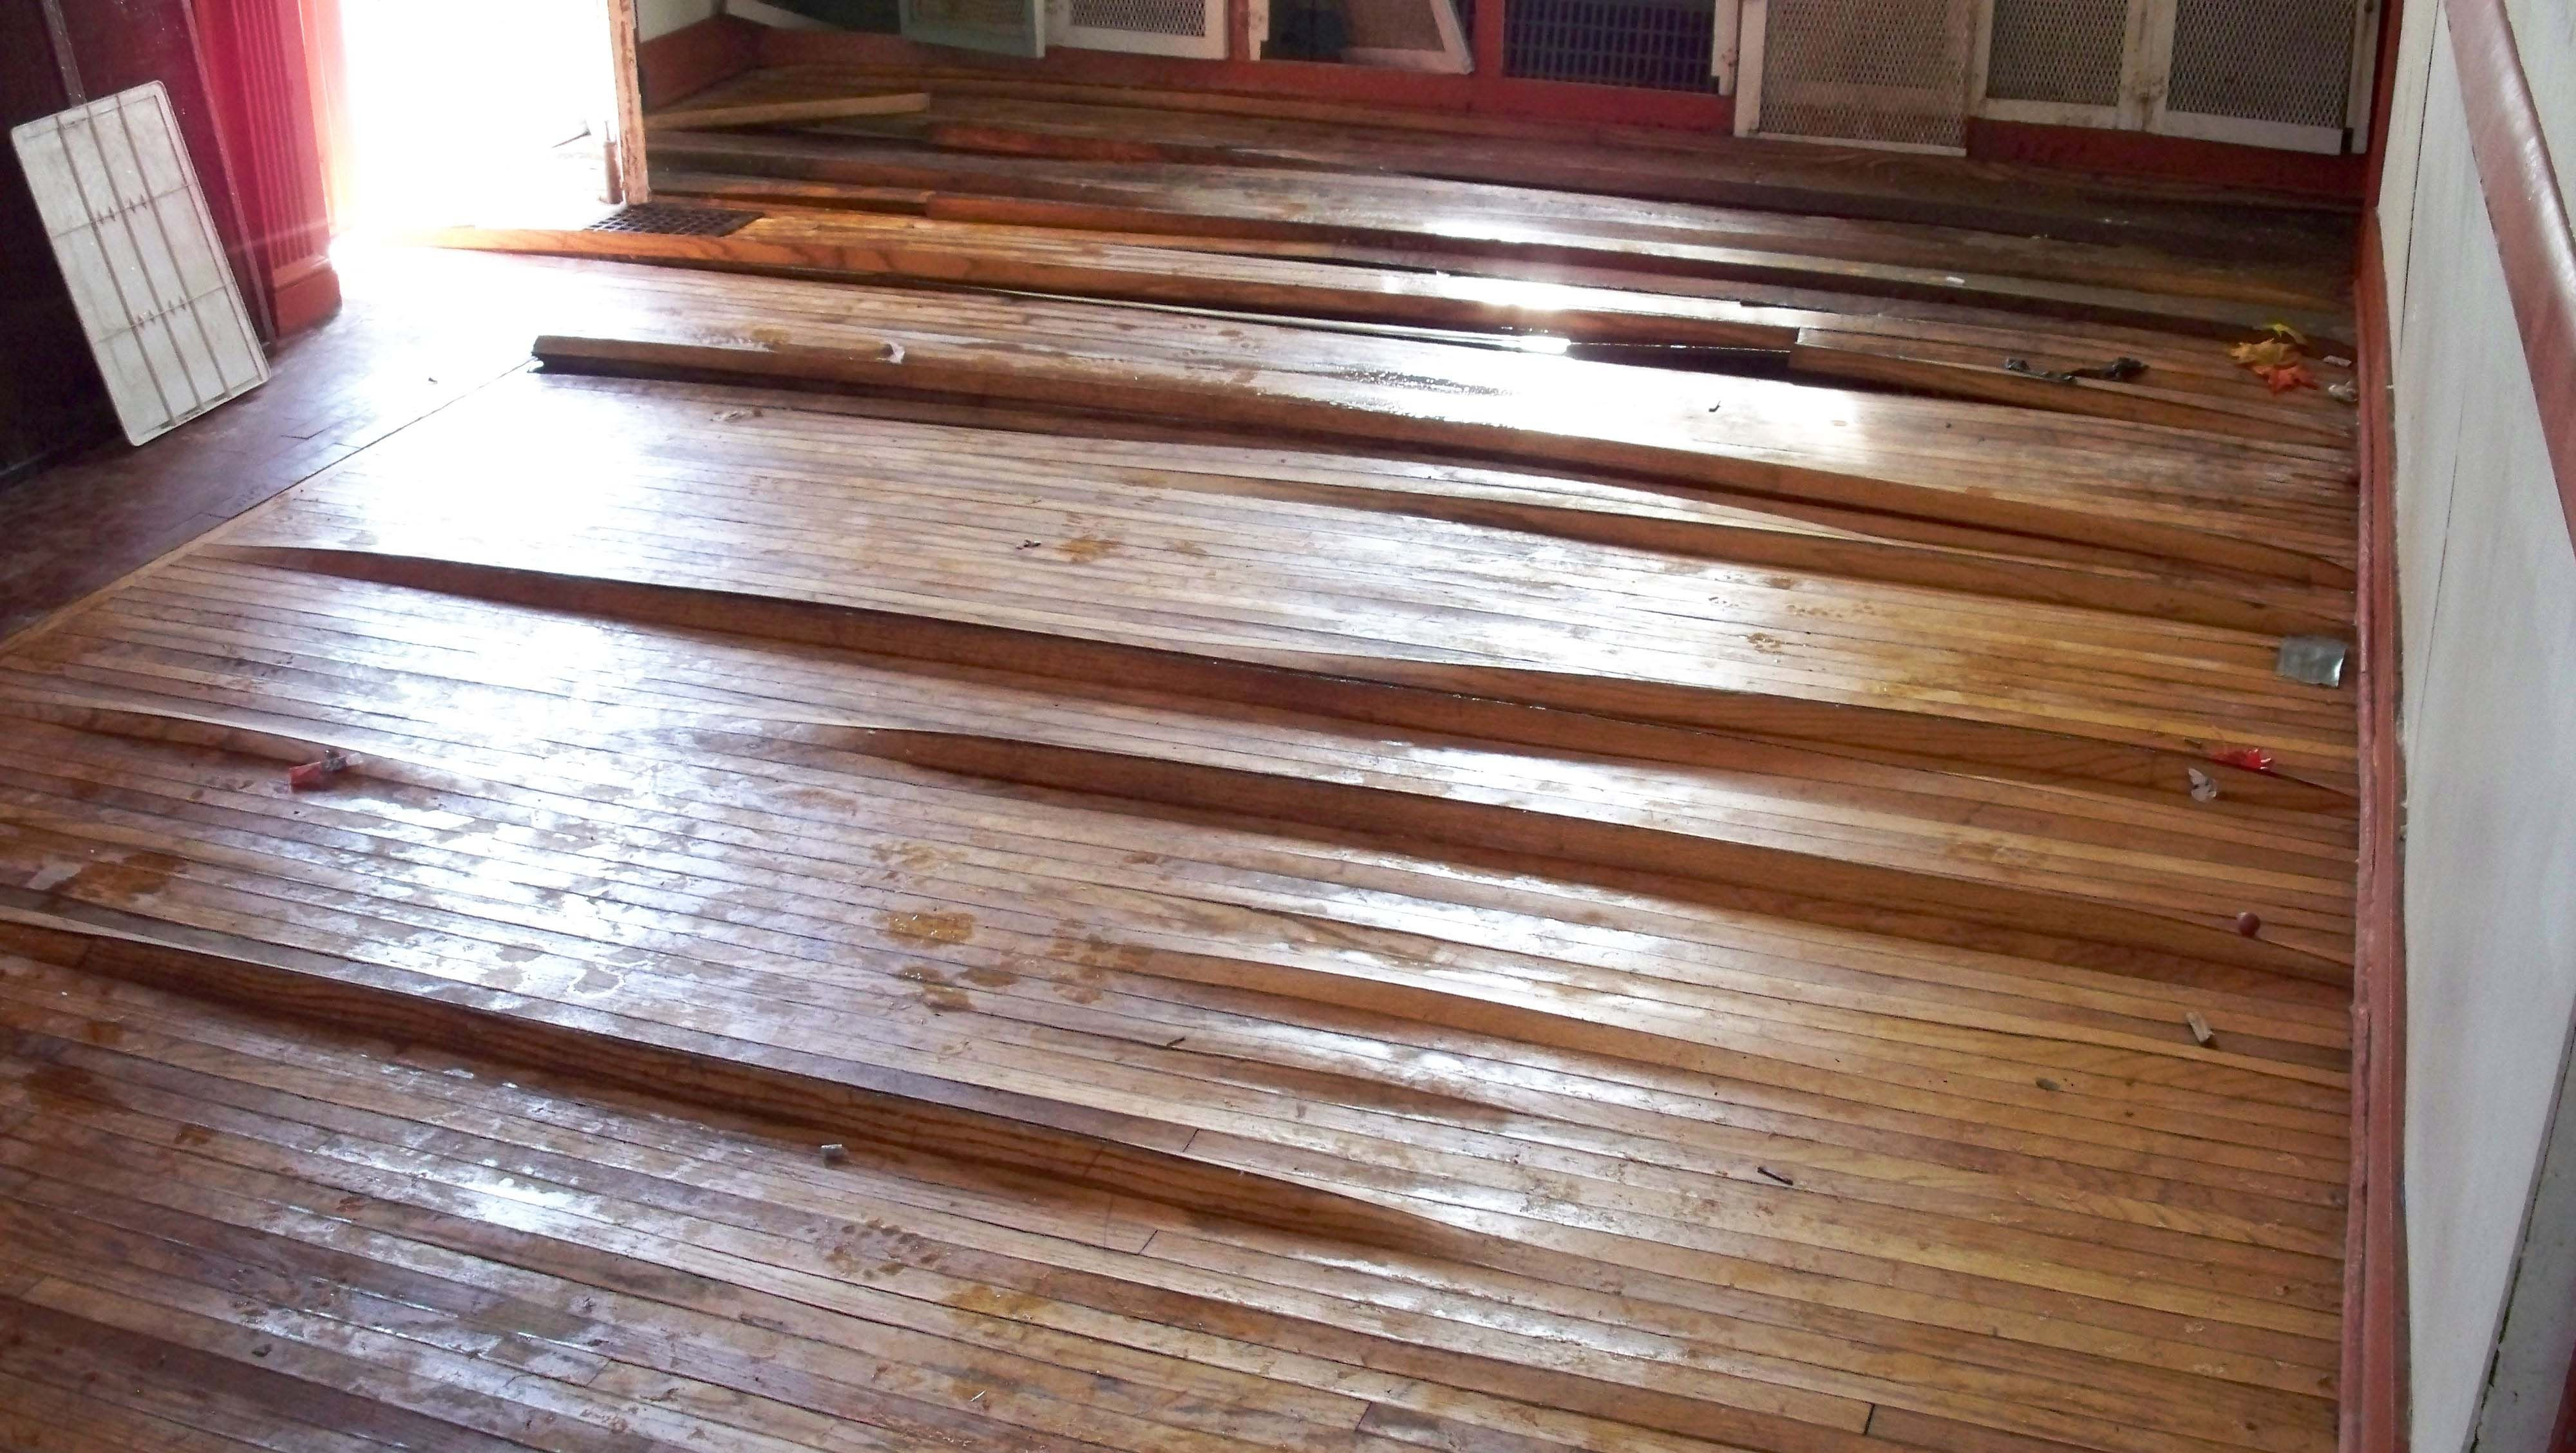 laminate vs hardwood vs engineered hardwood flooring of hardwood flooring vs engineered hardwood floor vs laminate awesome intended for hardwood flooring vs engineered hardwood floor water damage warping hardwood floors